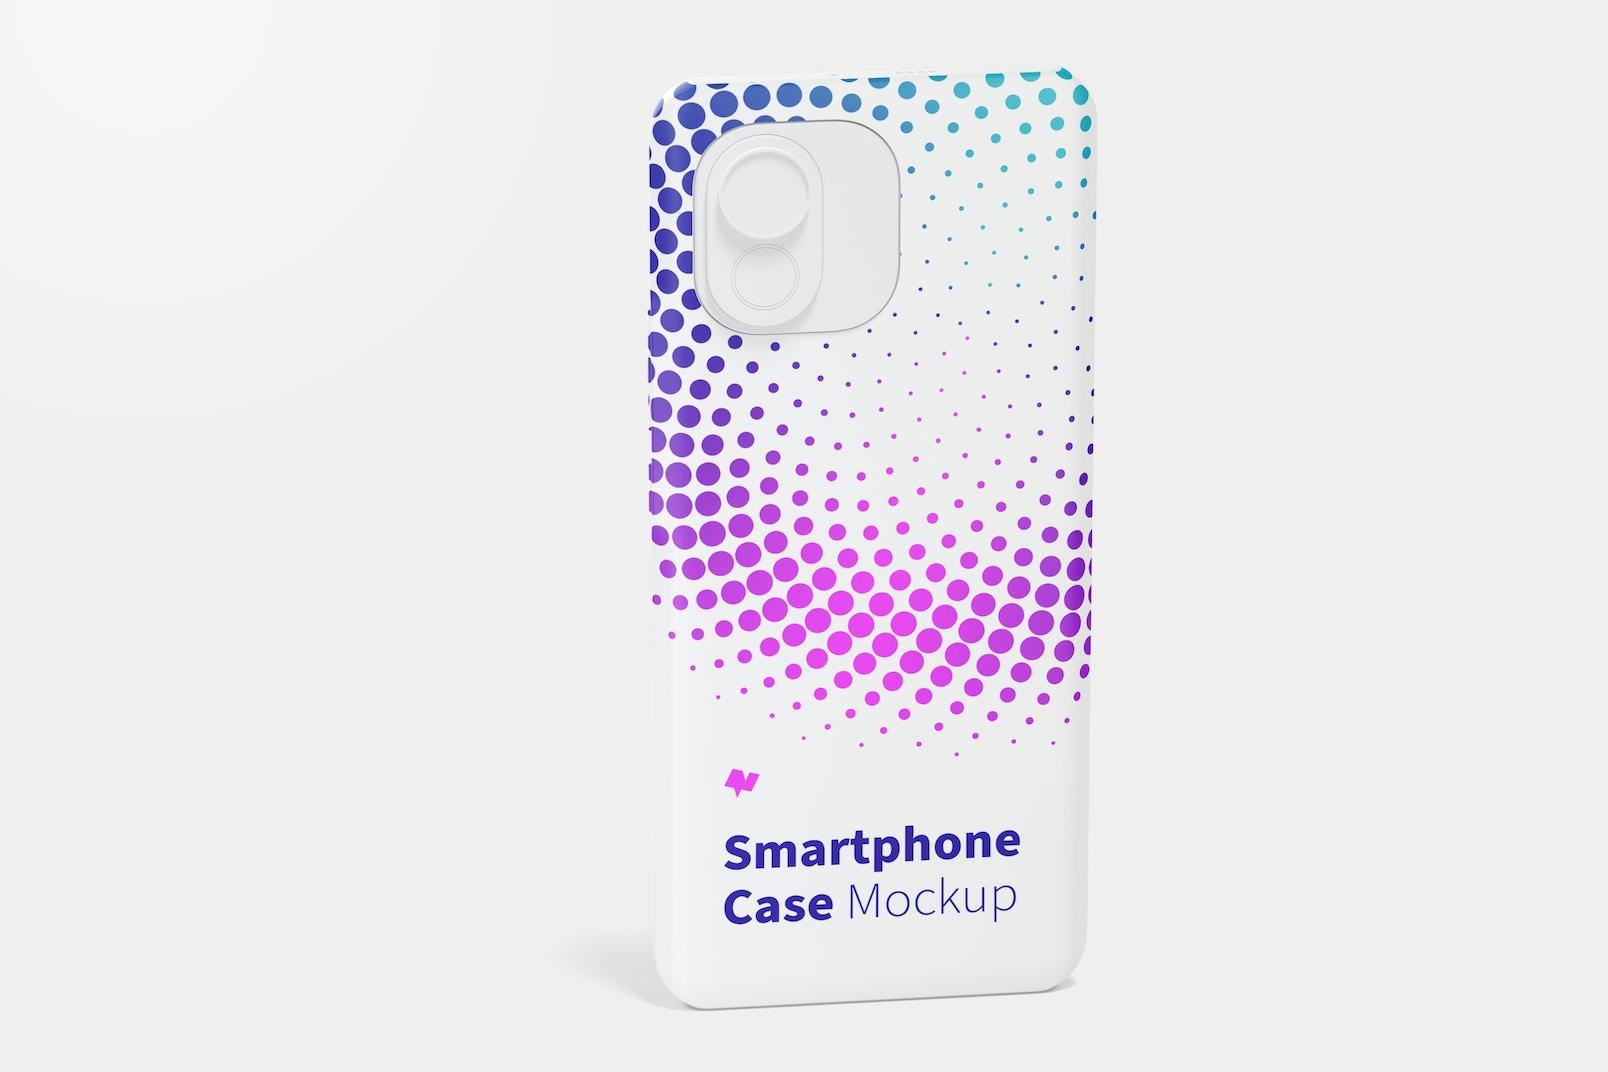 Xiaomi Case Mockup